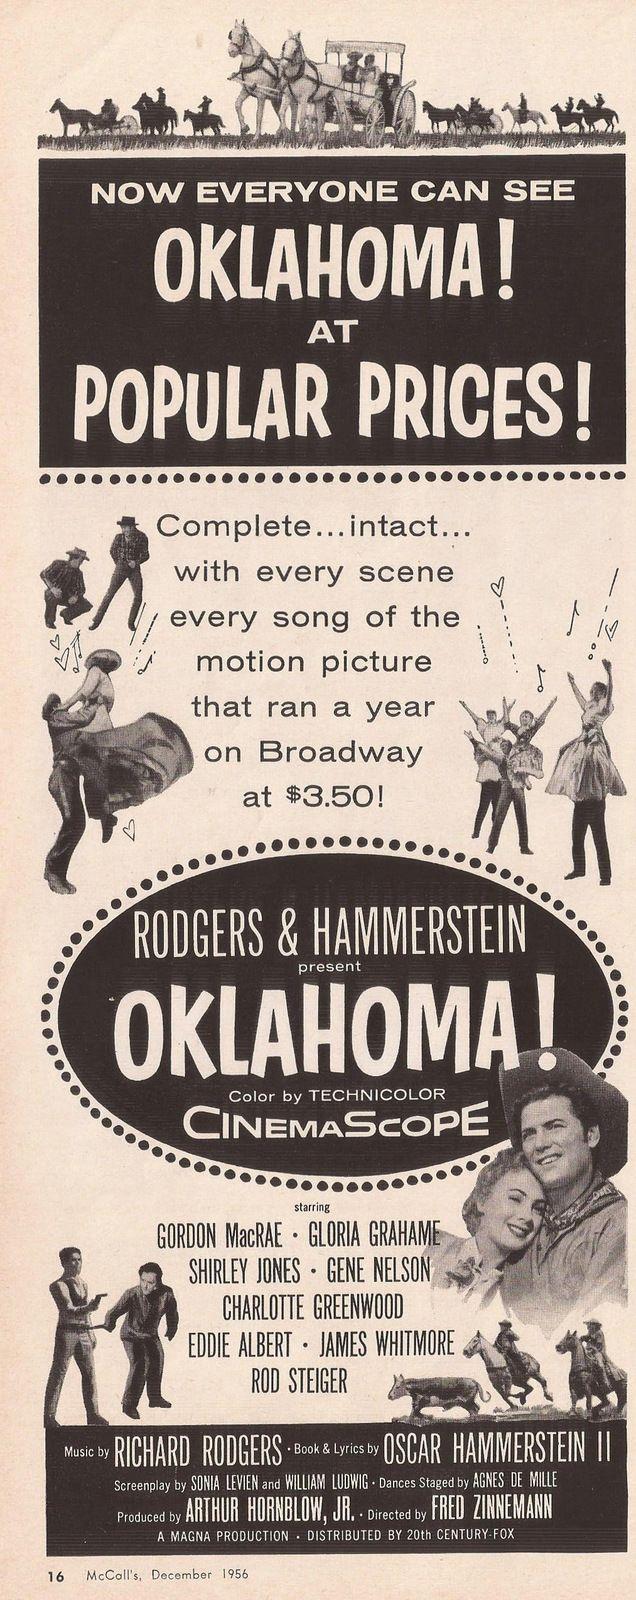 Vintage Oklahoma movie ad from McCall's magazine, December 1956